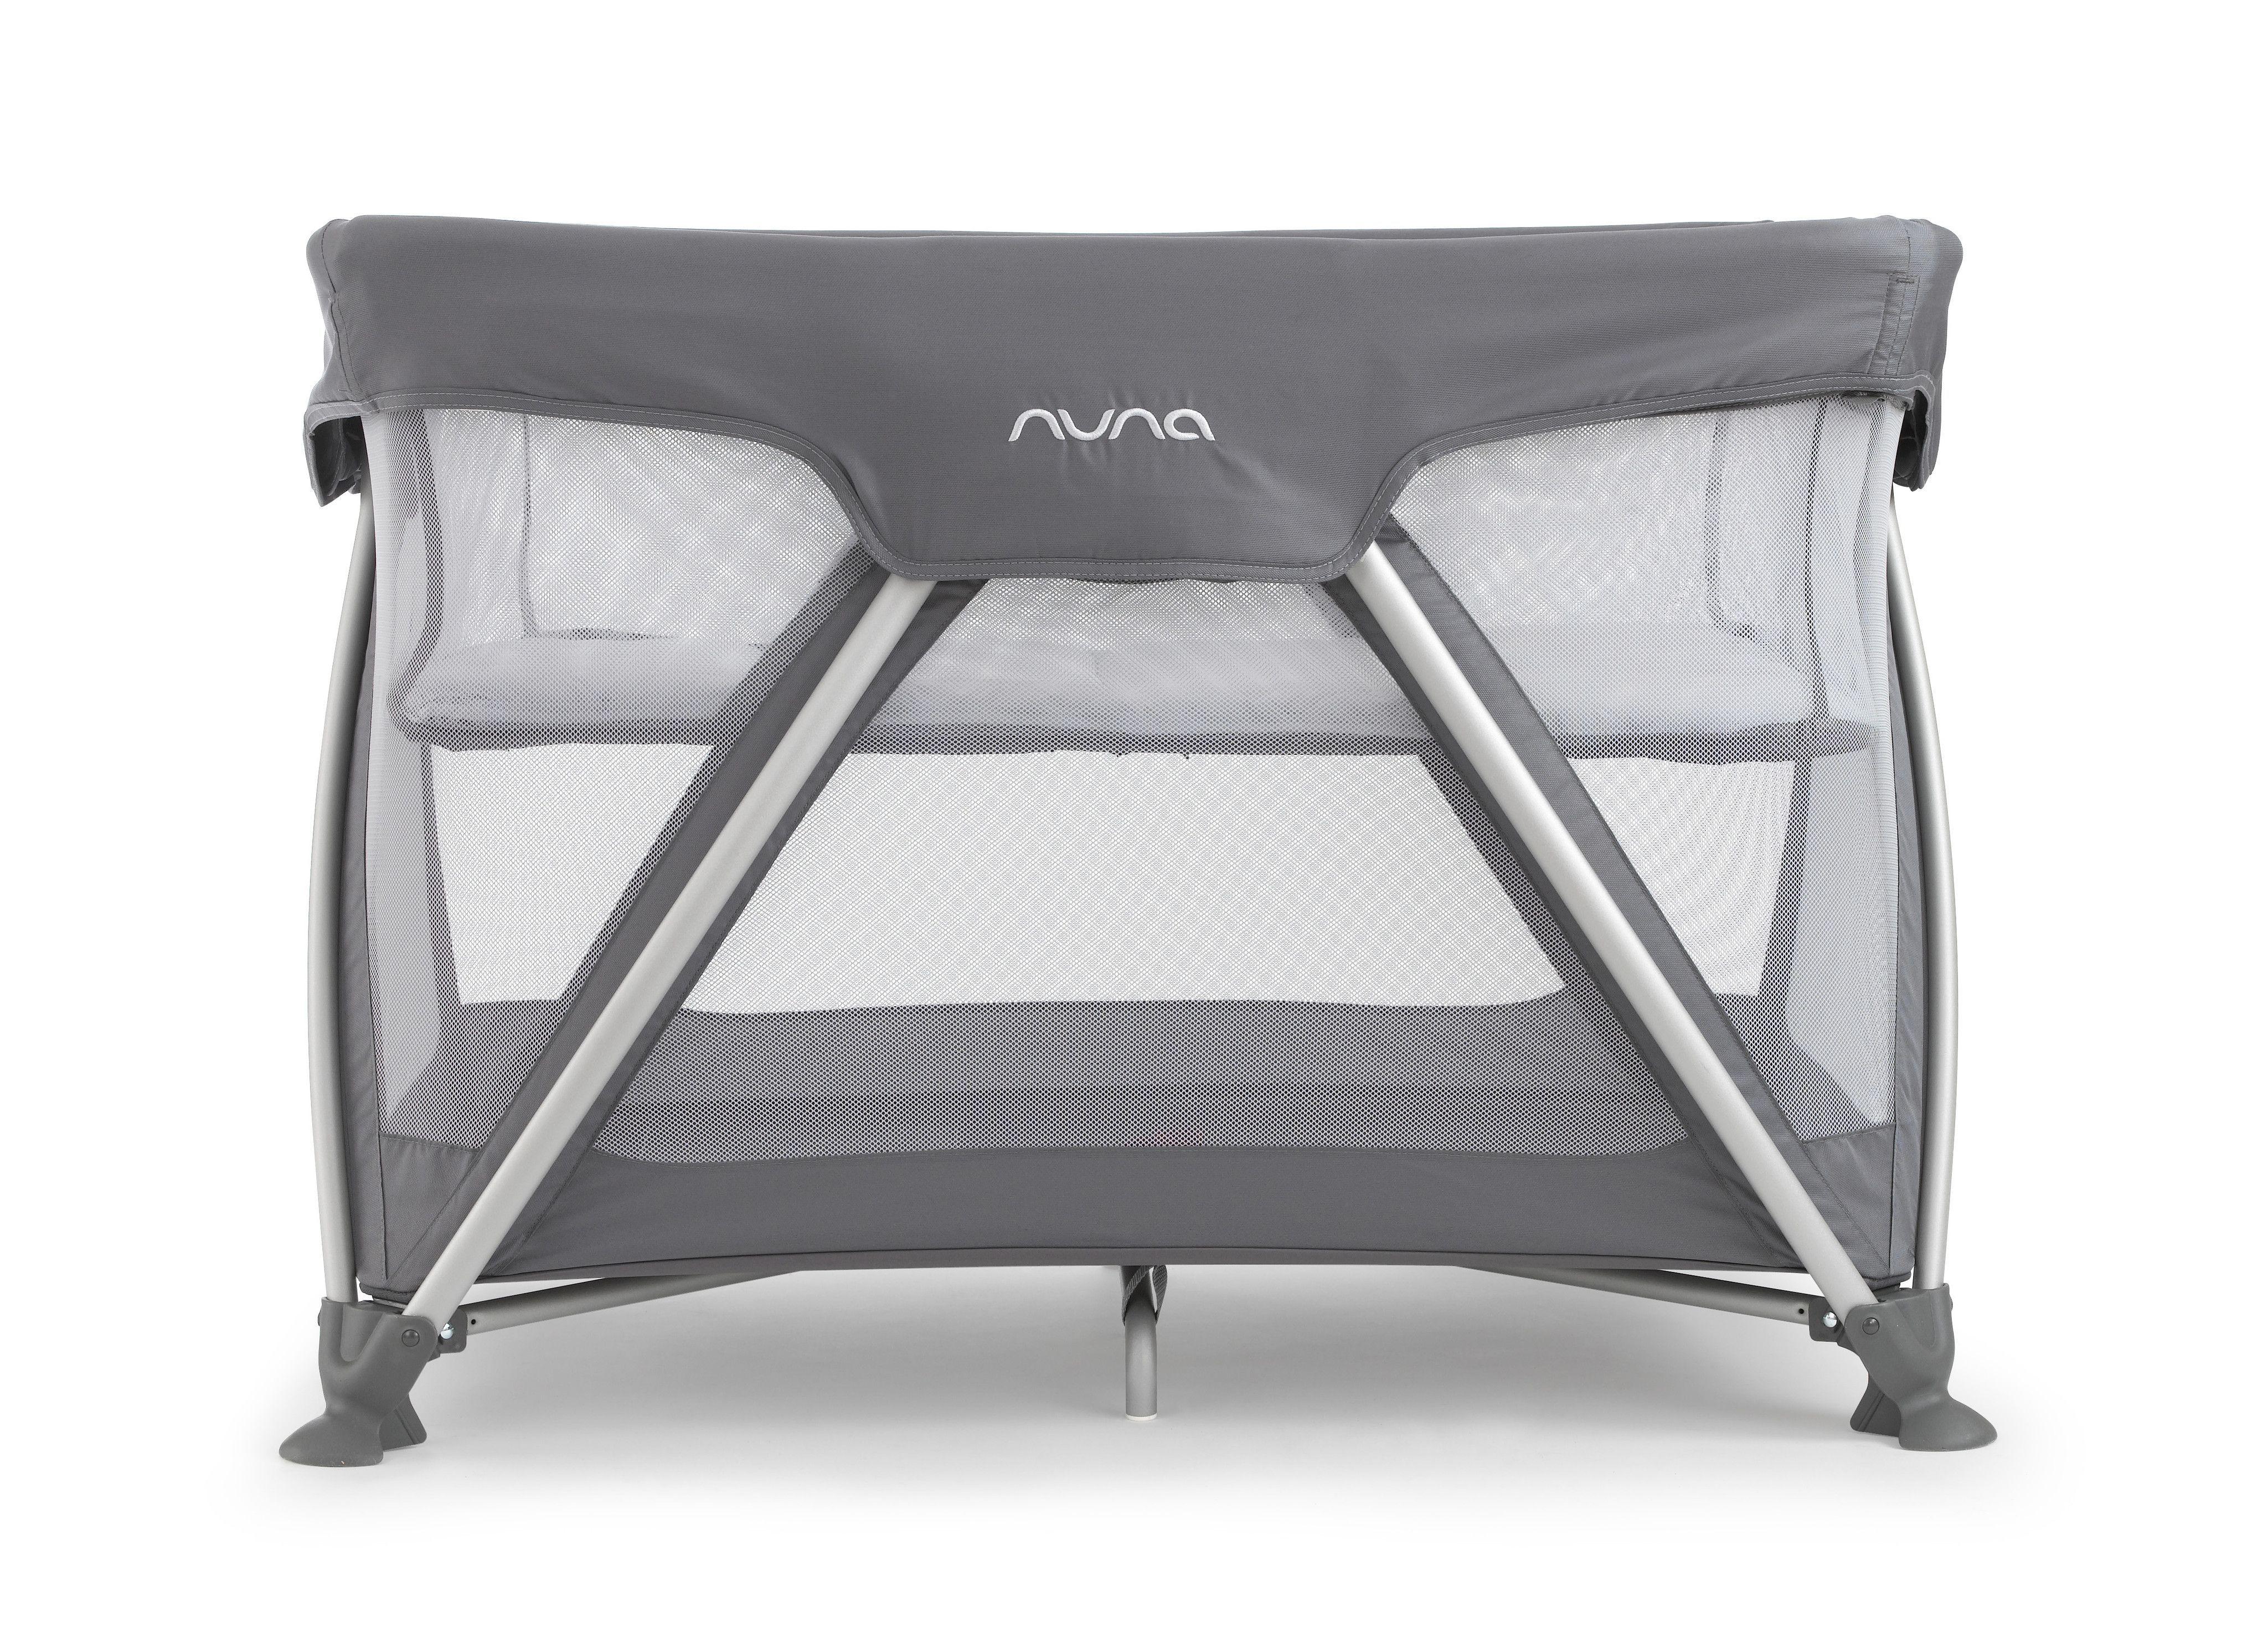 Nuna SENA Aire Organic Travel Crib (With images) Nuna